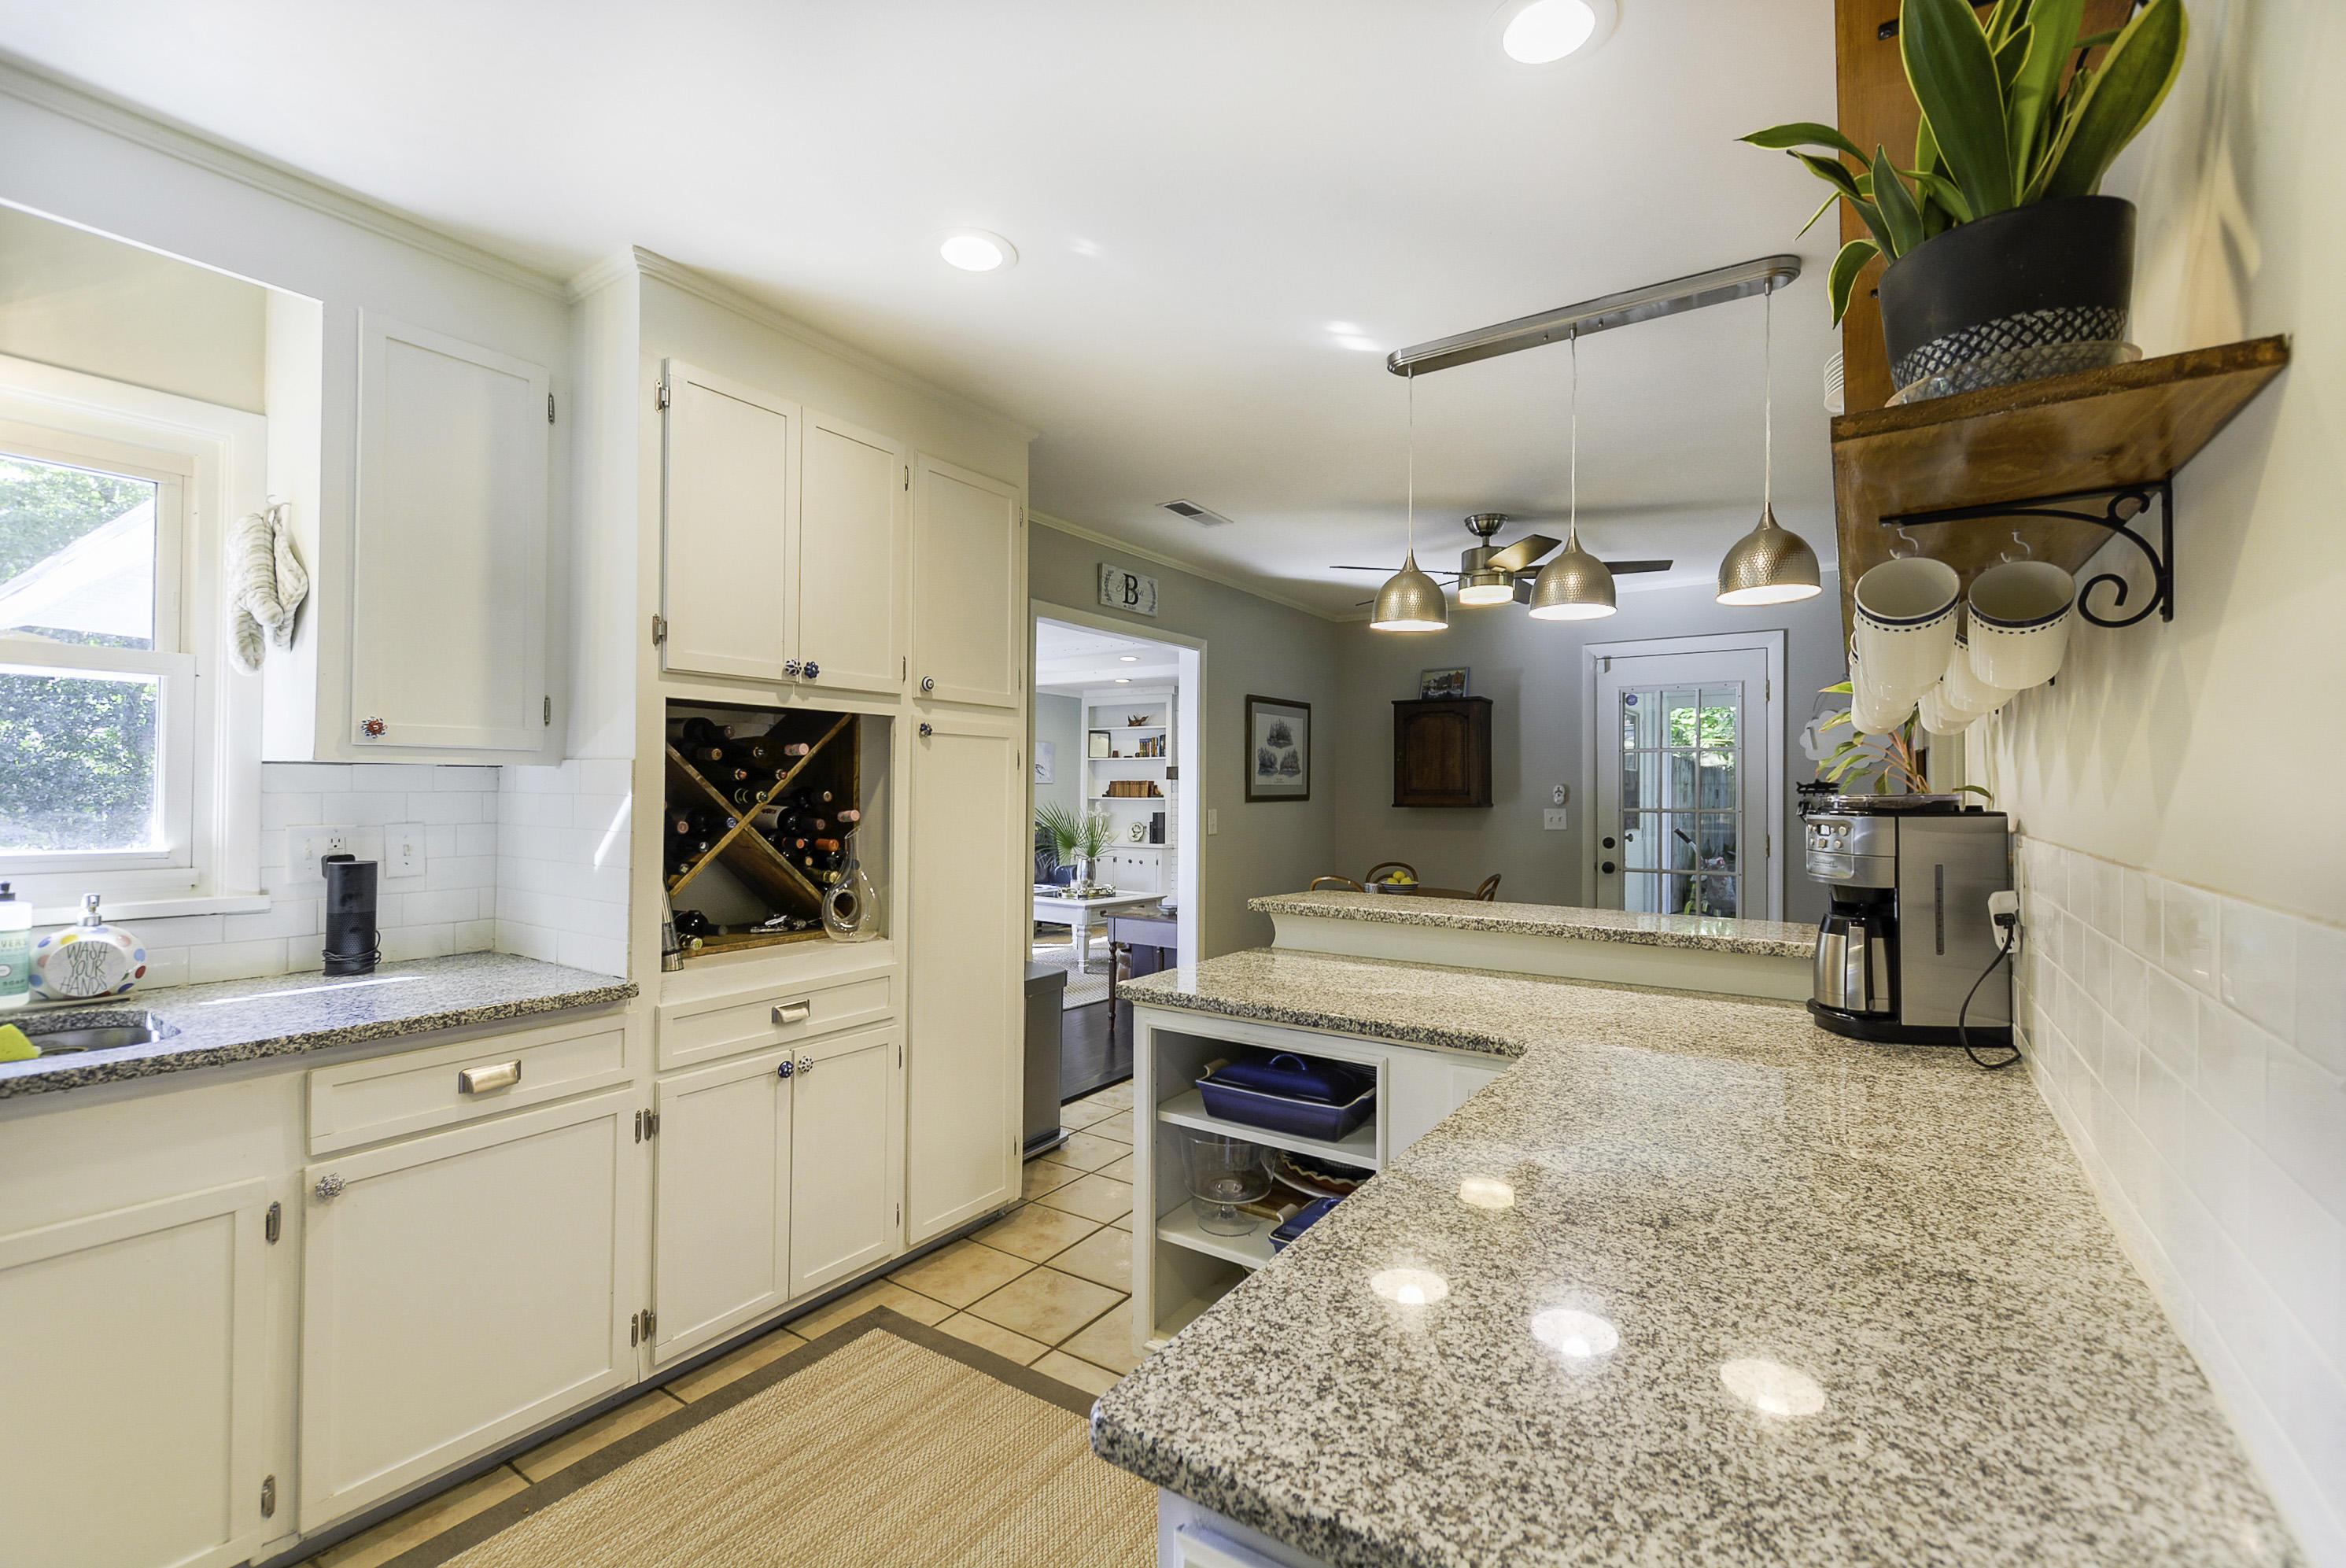 Avian Park Homes For Sale - 1212 Penny, Mount Pleasant, SC - 11